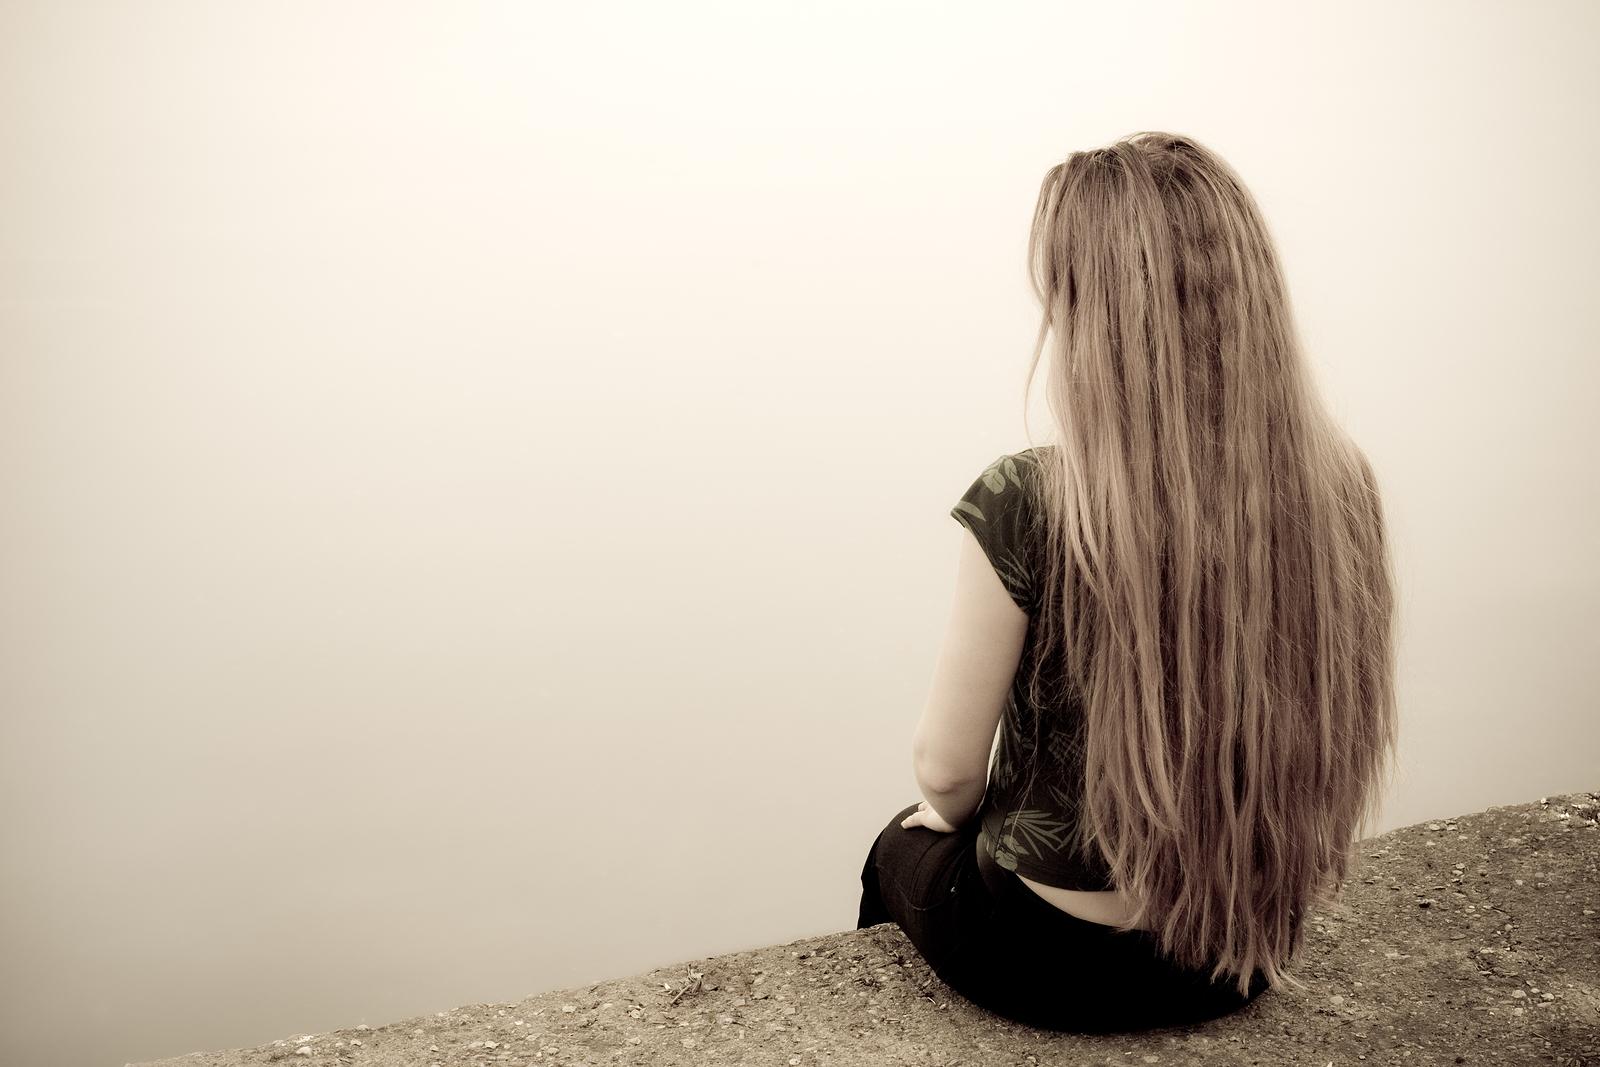 How Can I Help My Self Harming Teenager